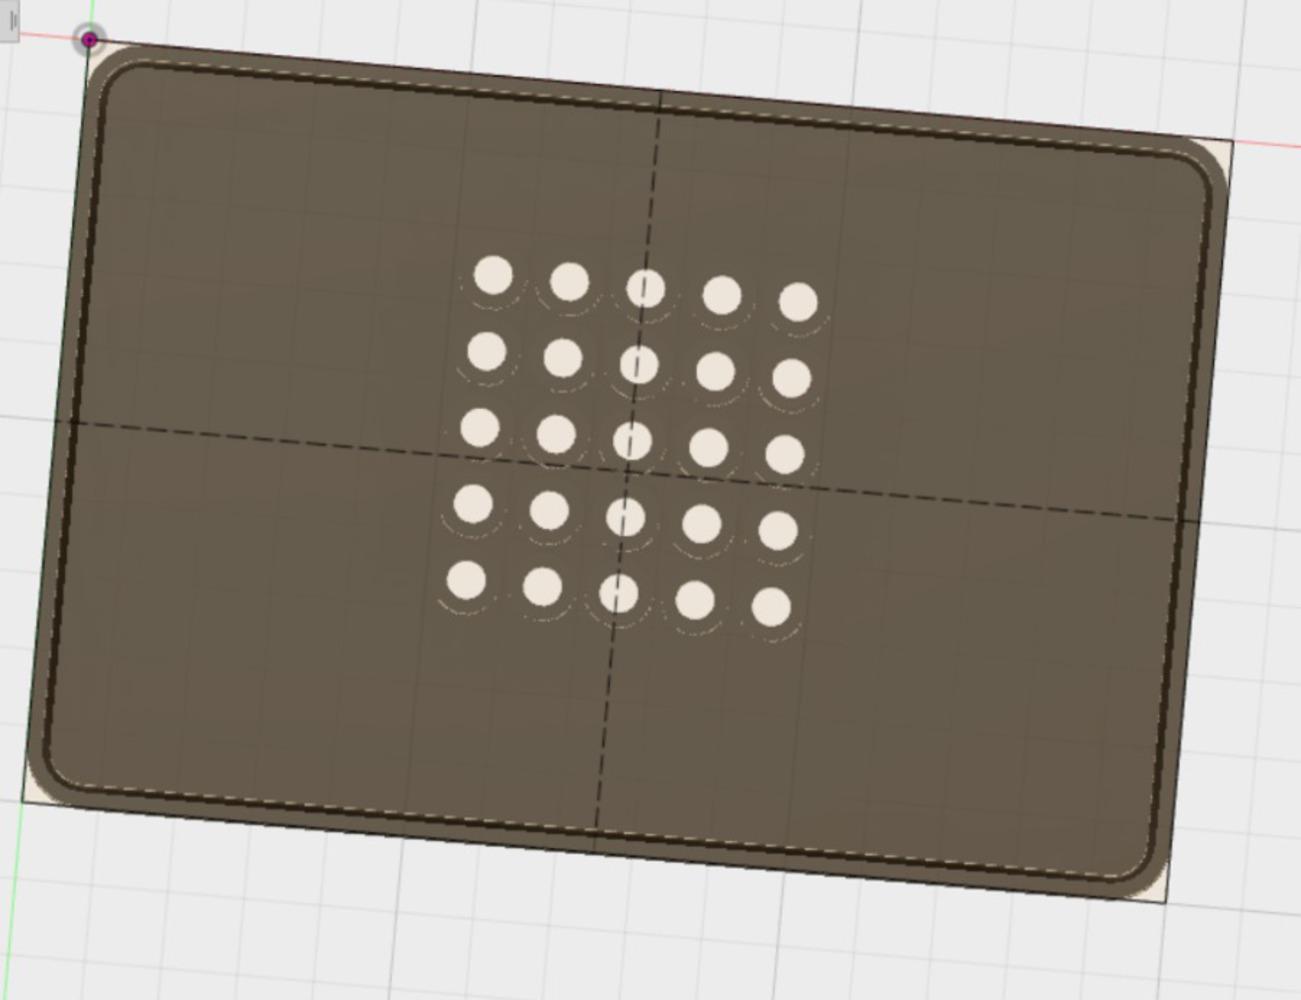 Fusionsoapholder2.png.thumb